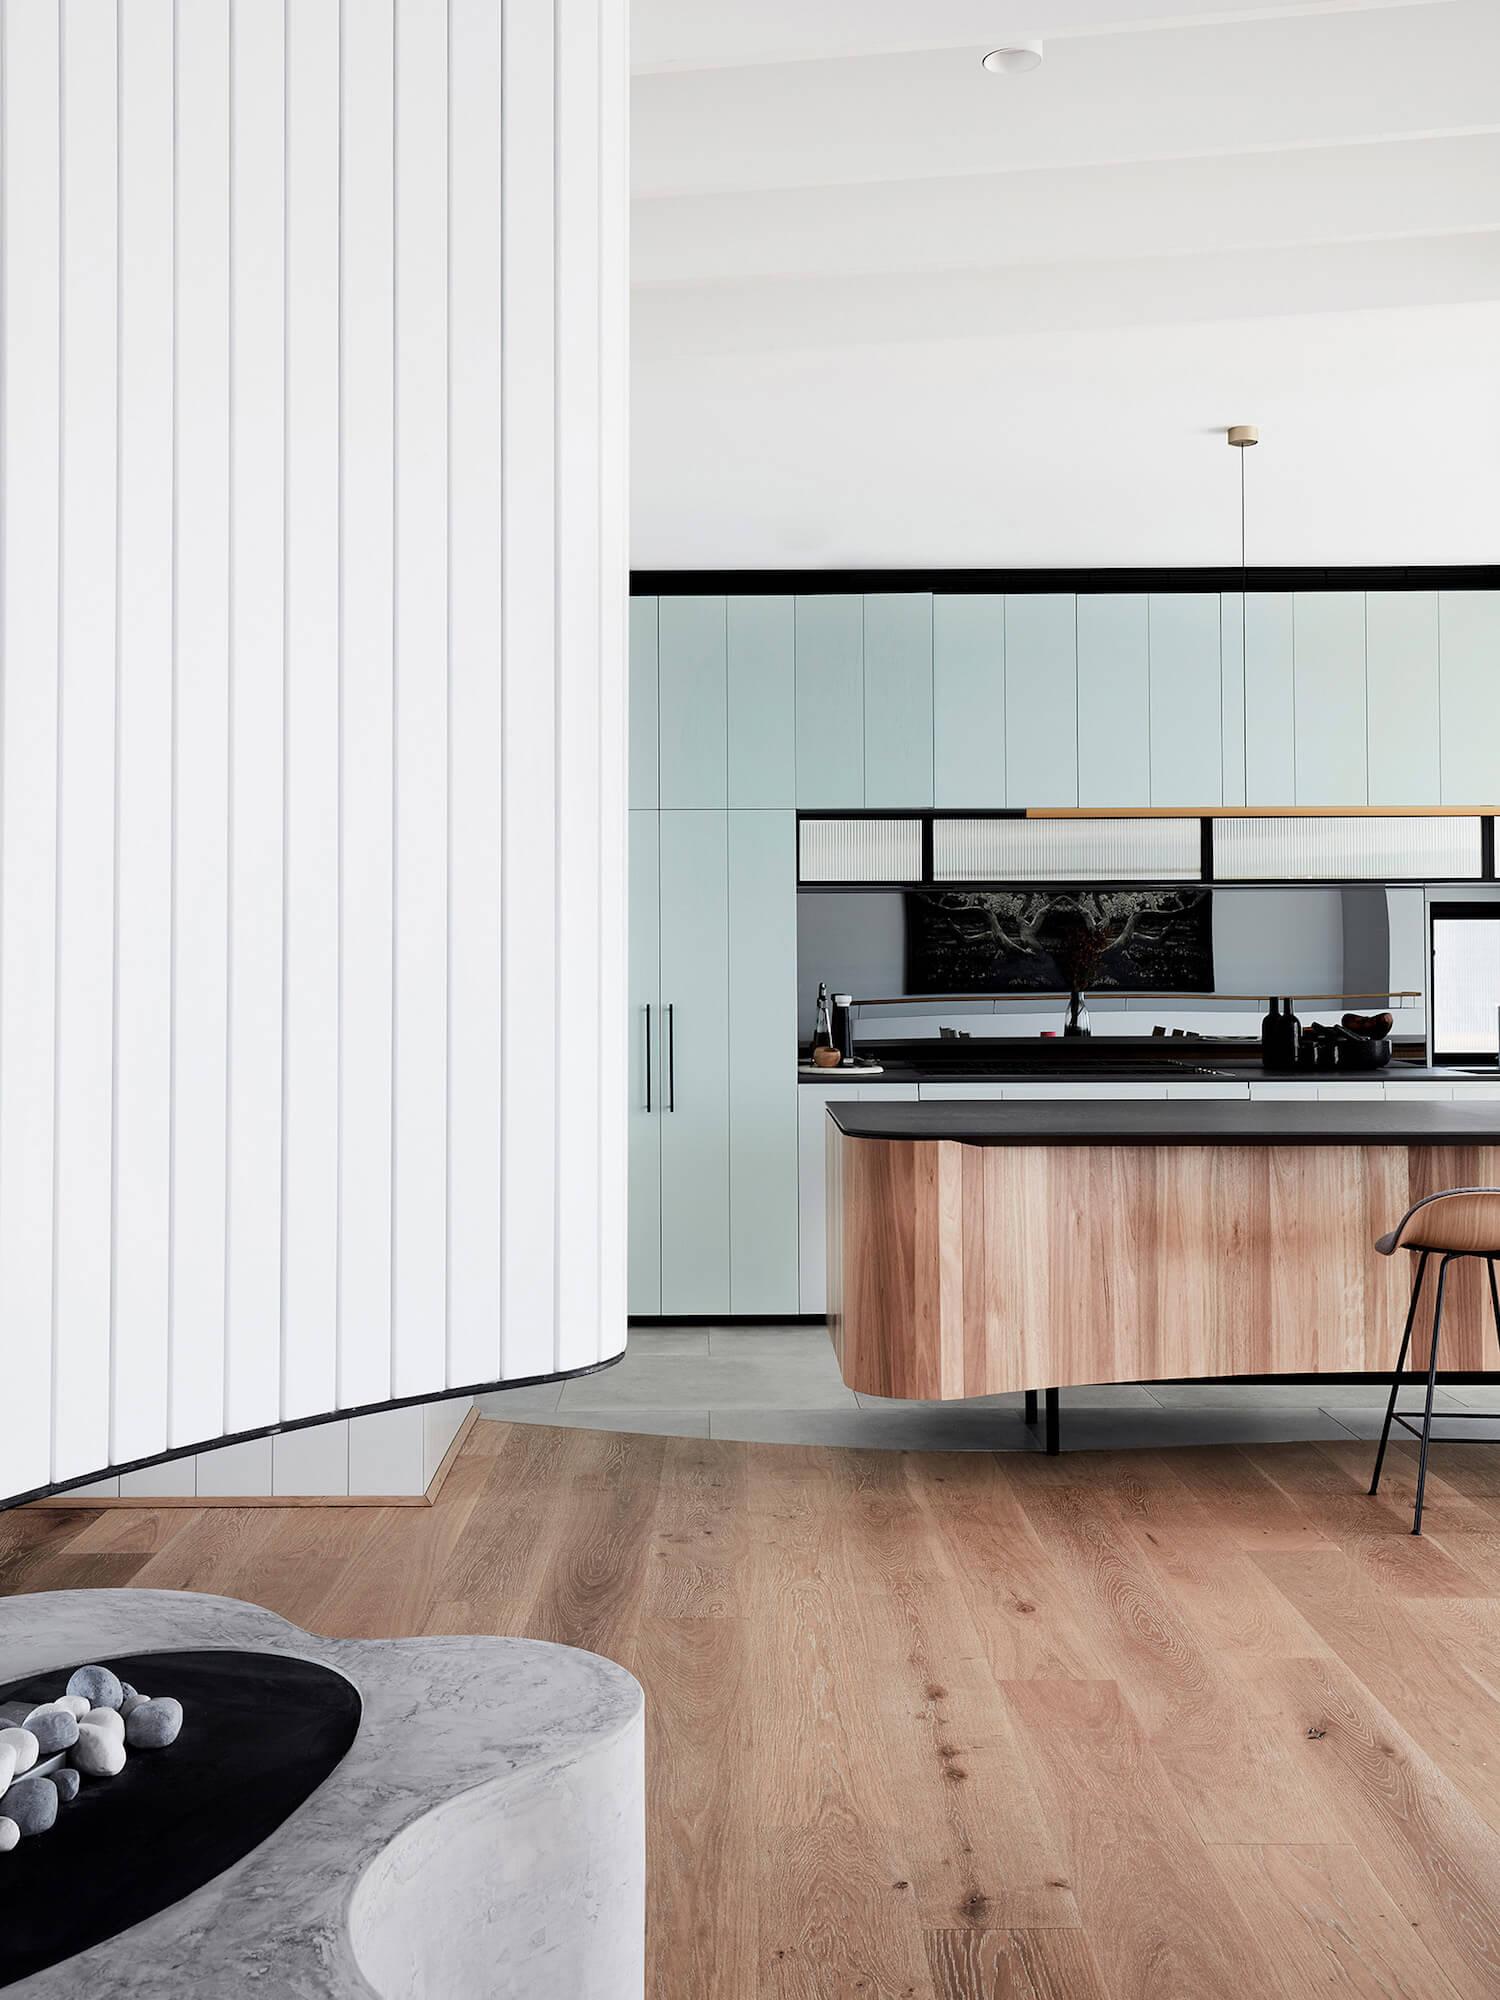 Tam S Tee House By Luigi Rosselli Australian Interiors